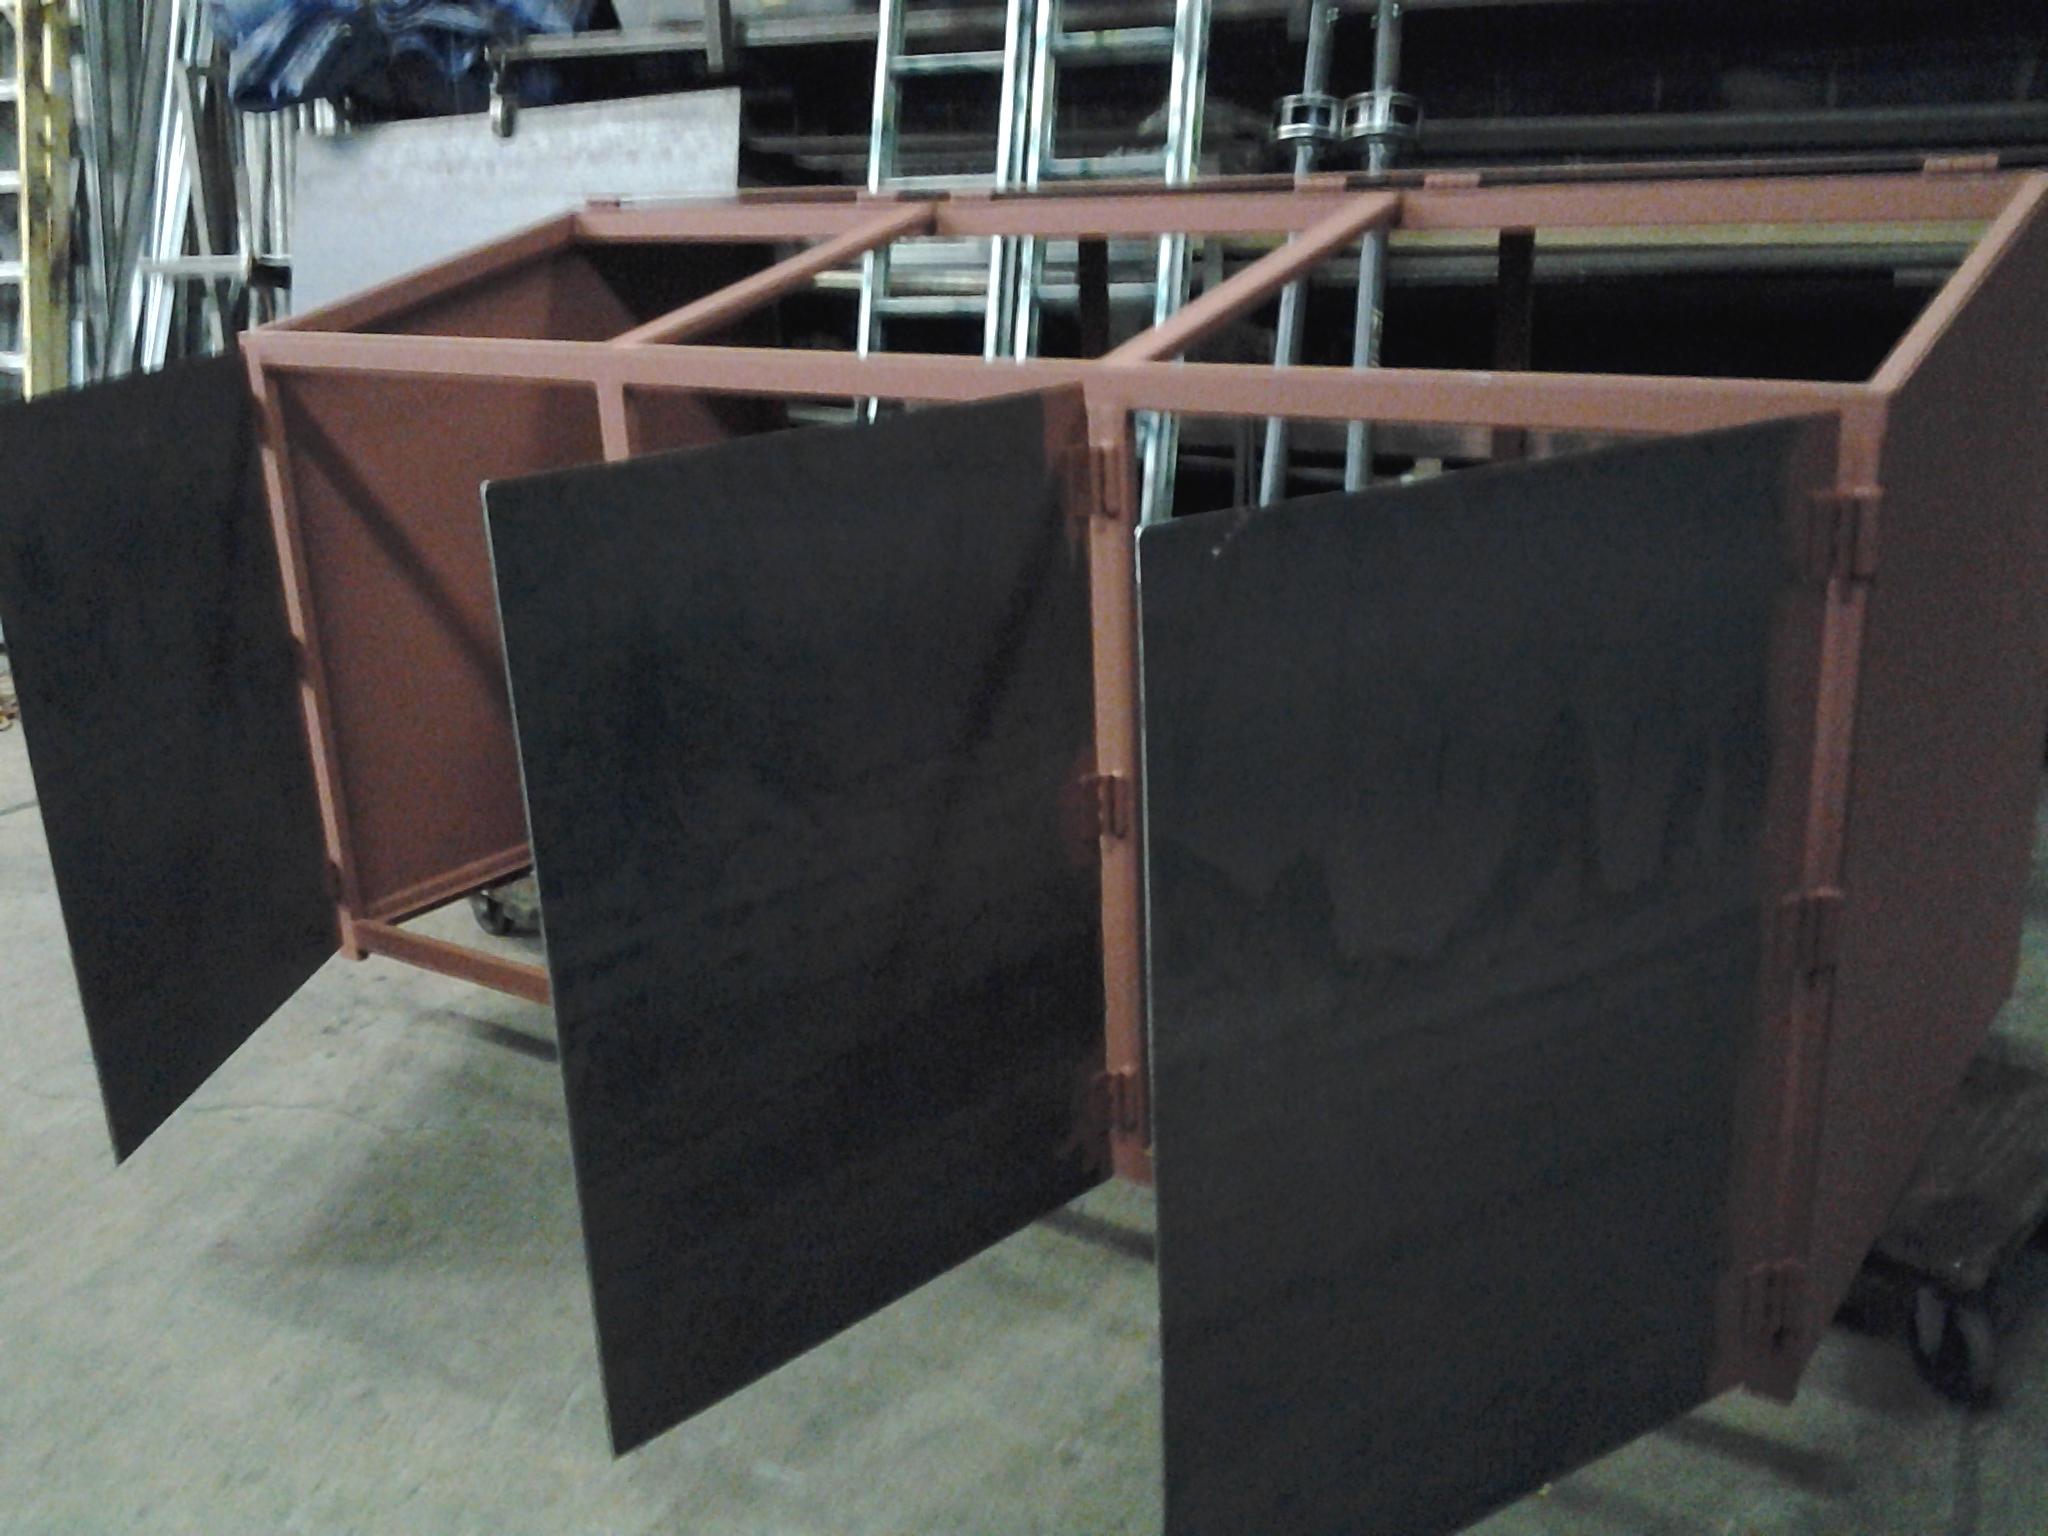 Steel Garbage Bins - New York, NY